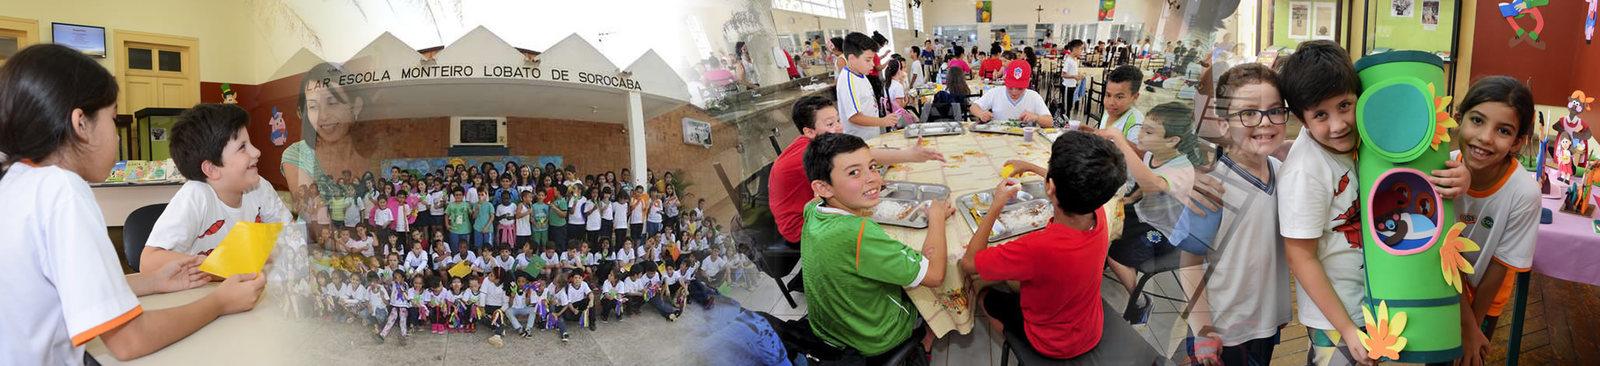 [NÓS] Reduce Inequality with Kids - Sorocaba, Sao Paulo